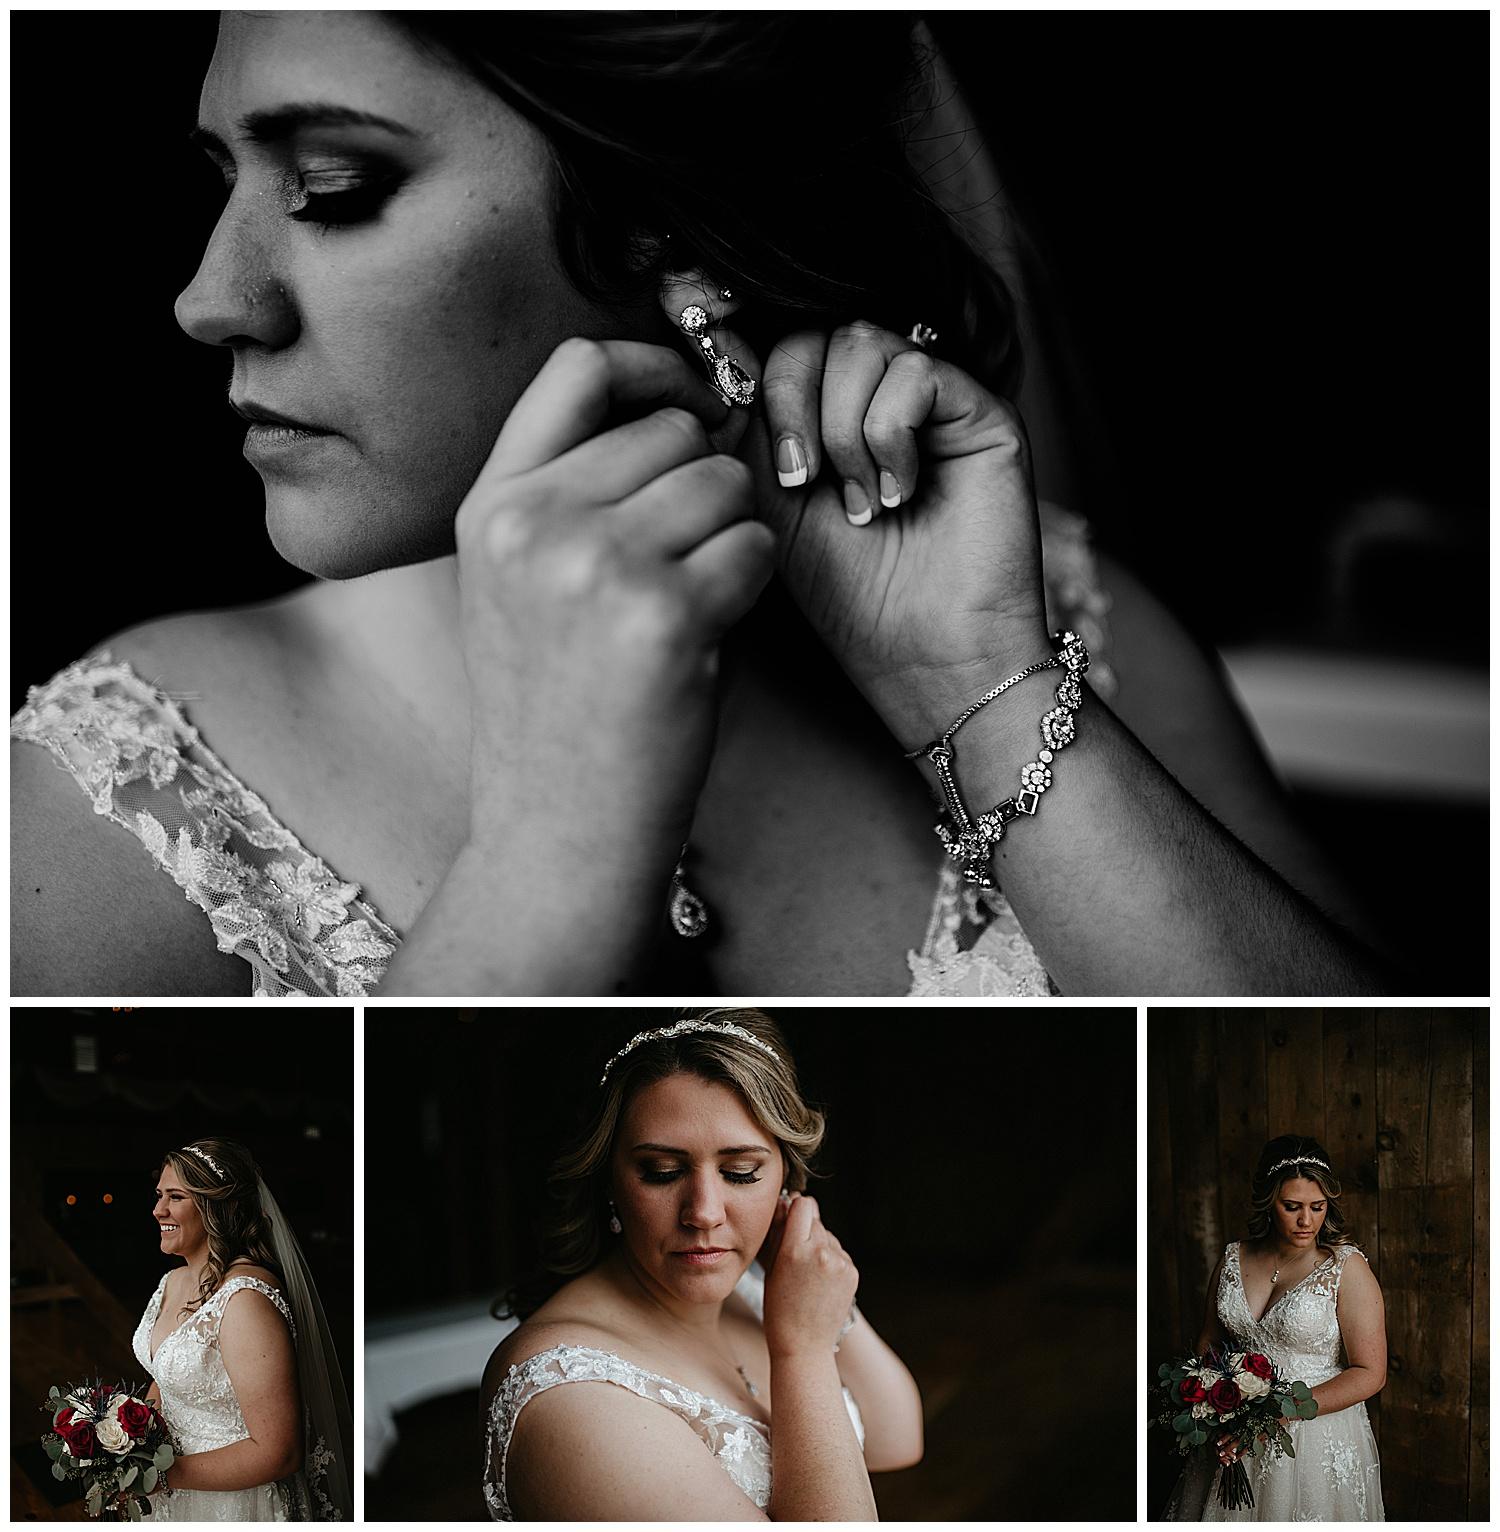 NEPA-Bloomgsburg-Wedding-Photographer-at-The-Barn-at-Greystone-Farms-Watsontown-PA_0118.jpg